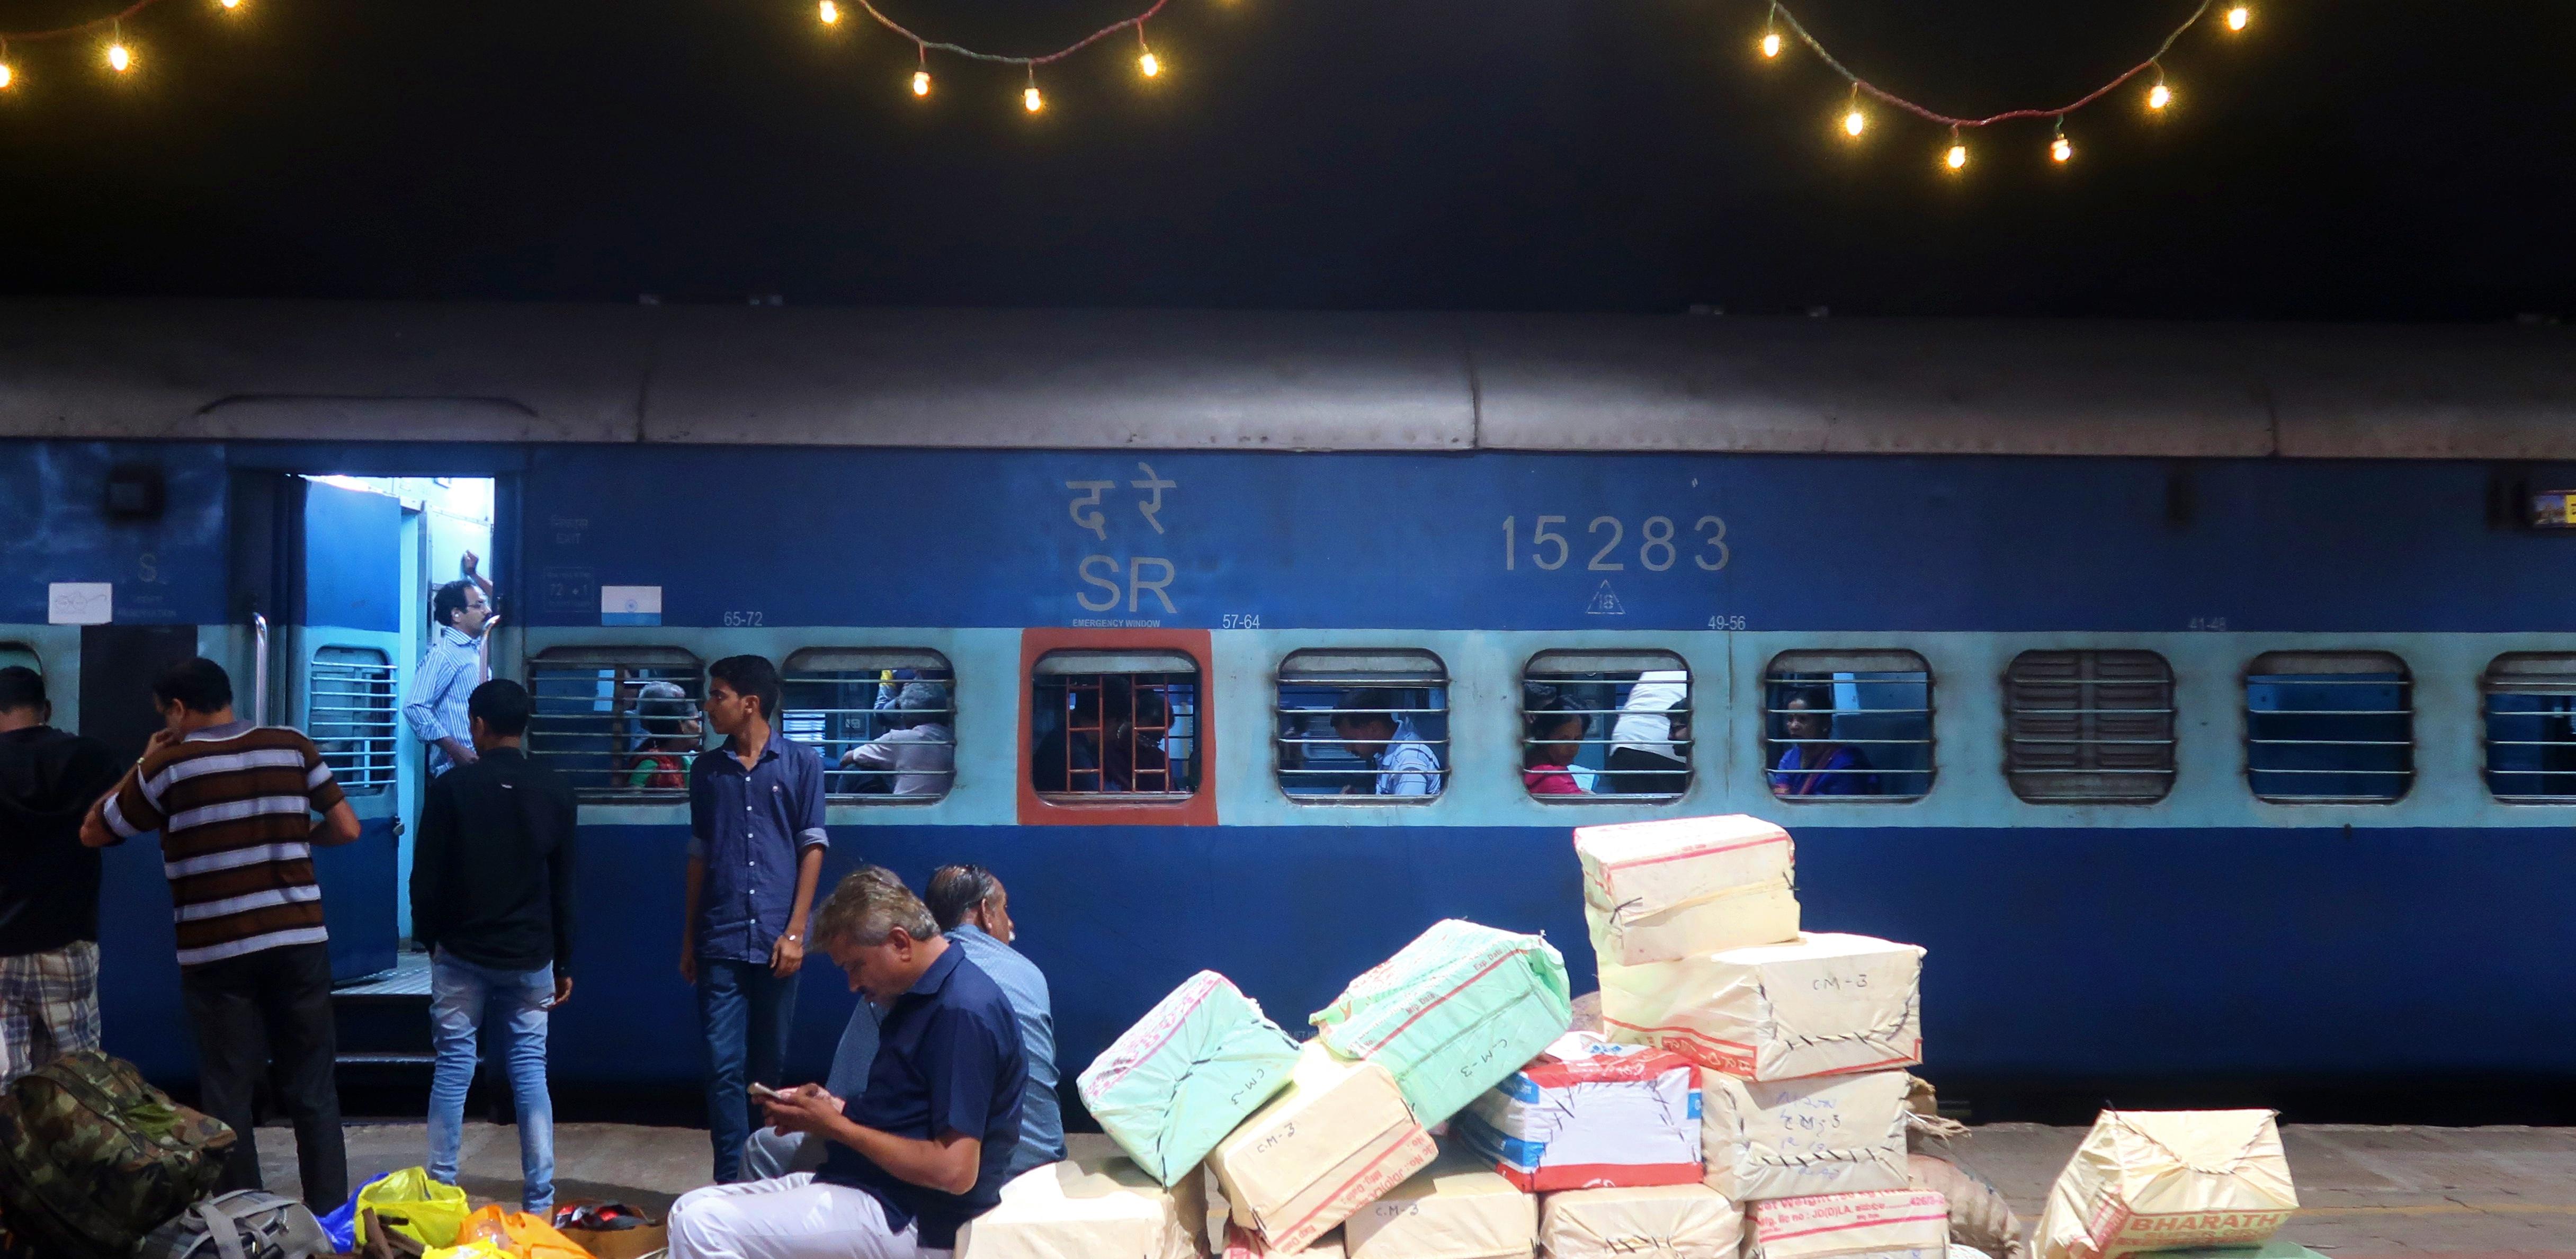 train in india at station at night